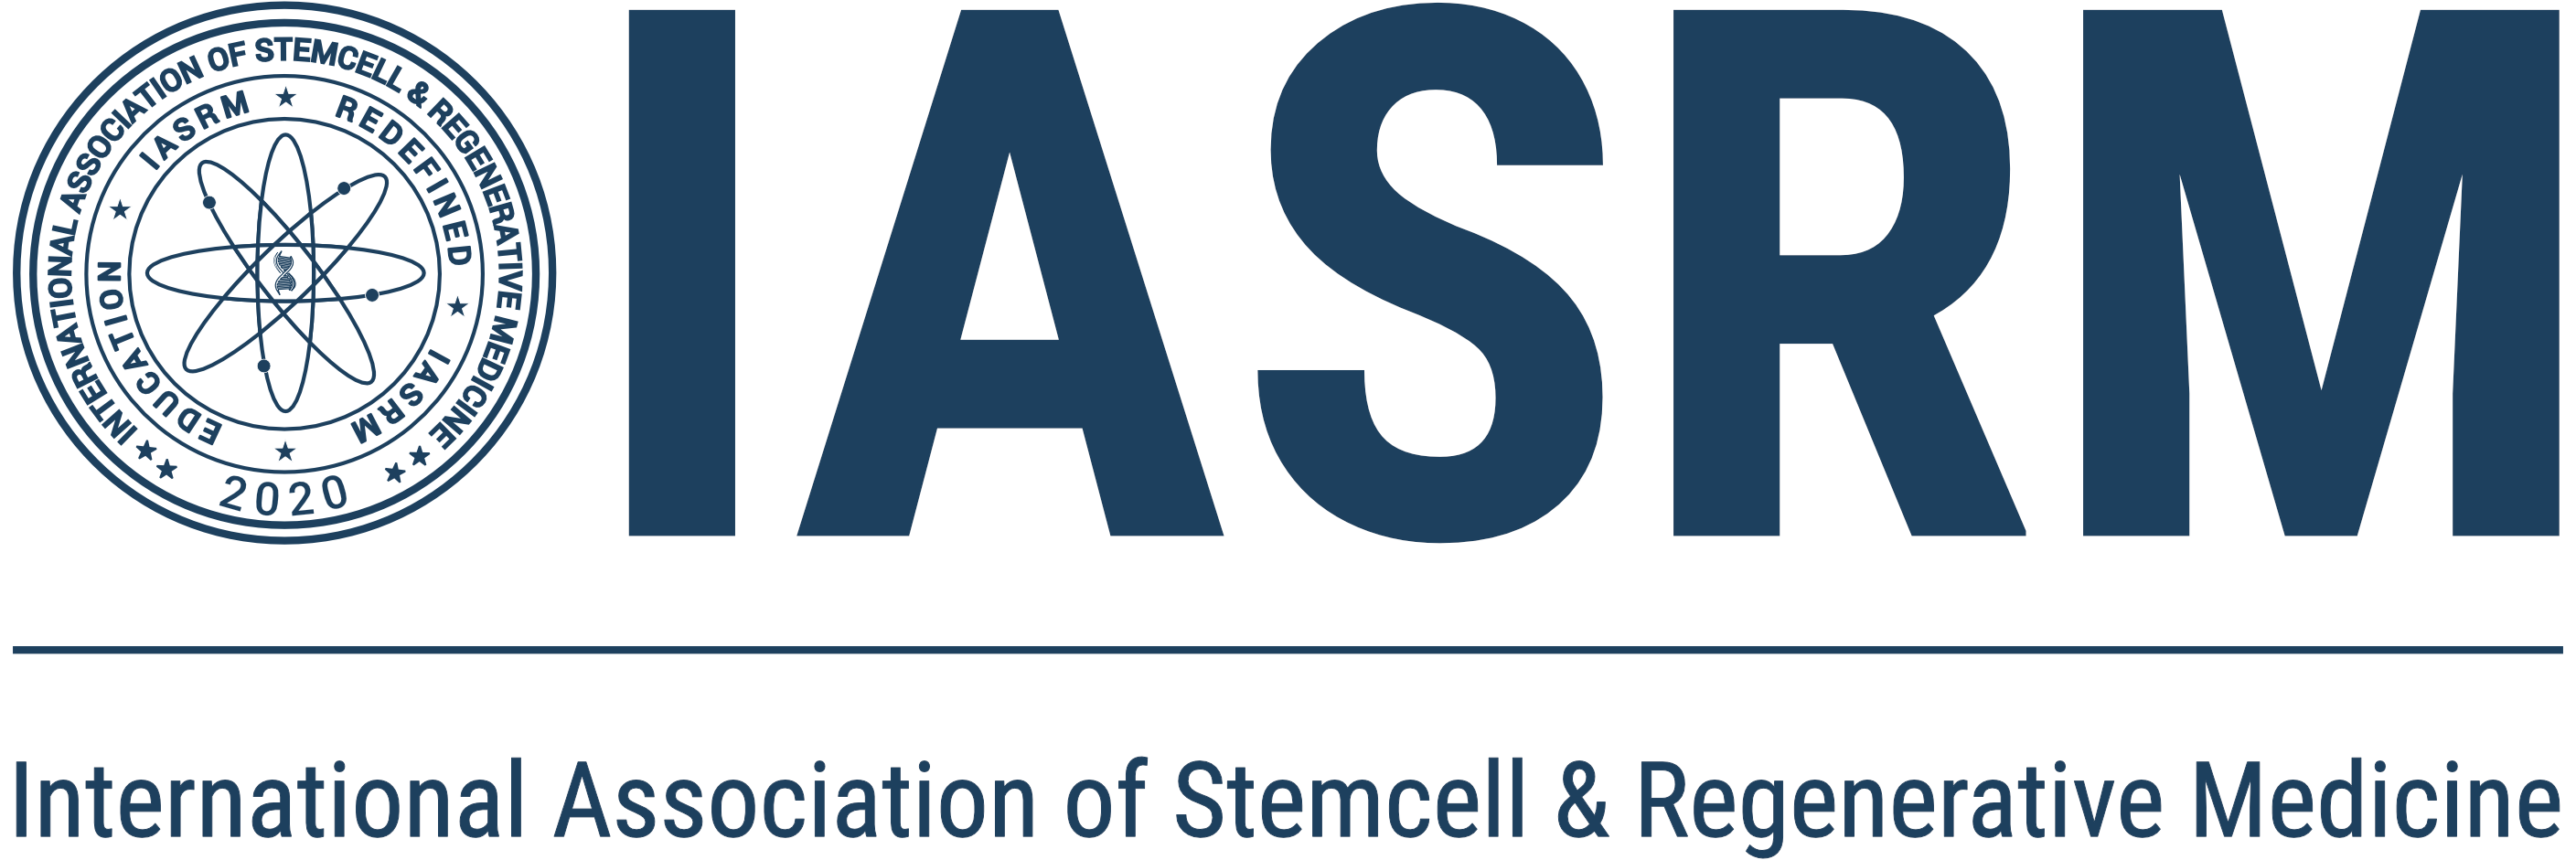 International Association of Stemcell & Regenerative Medicine (IASRM)